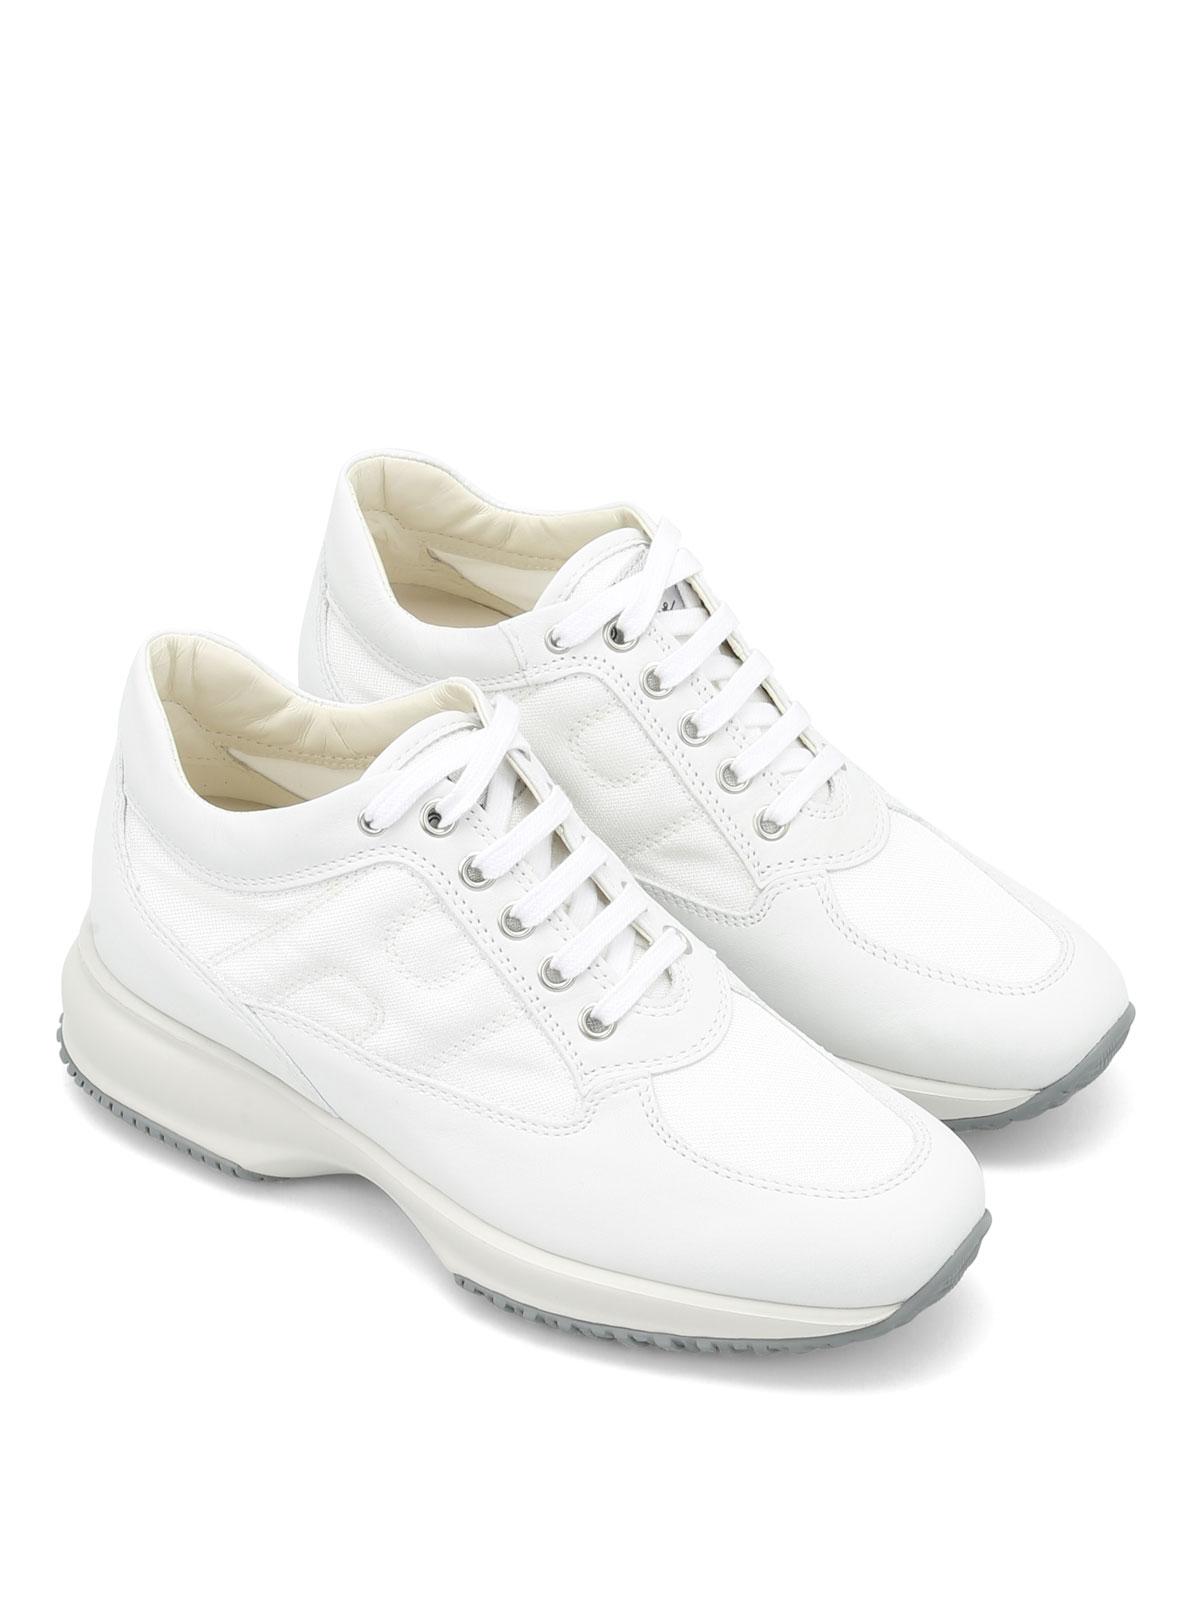 Sneakers Hogan - Interactive in pelle e tessuto - HXW00N00E10FI8B001